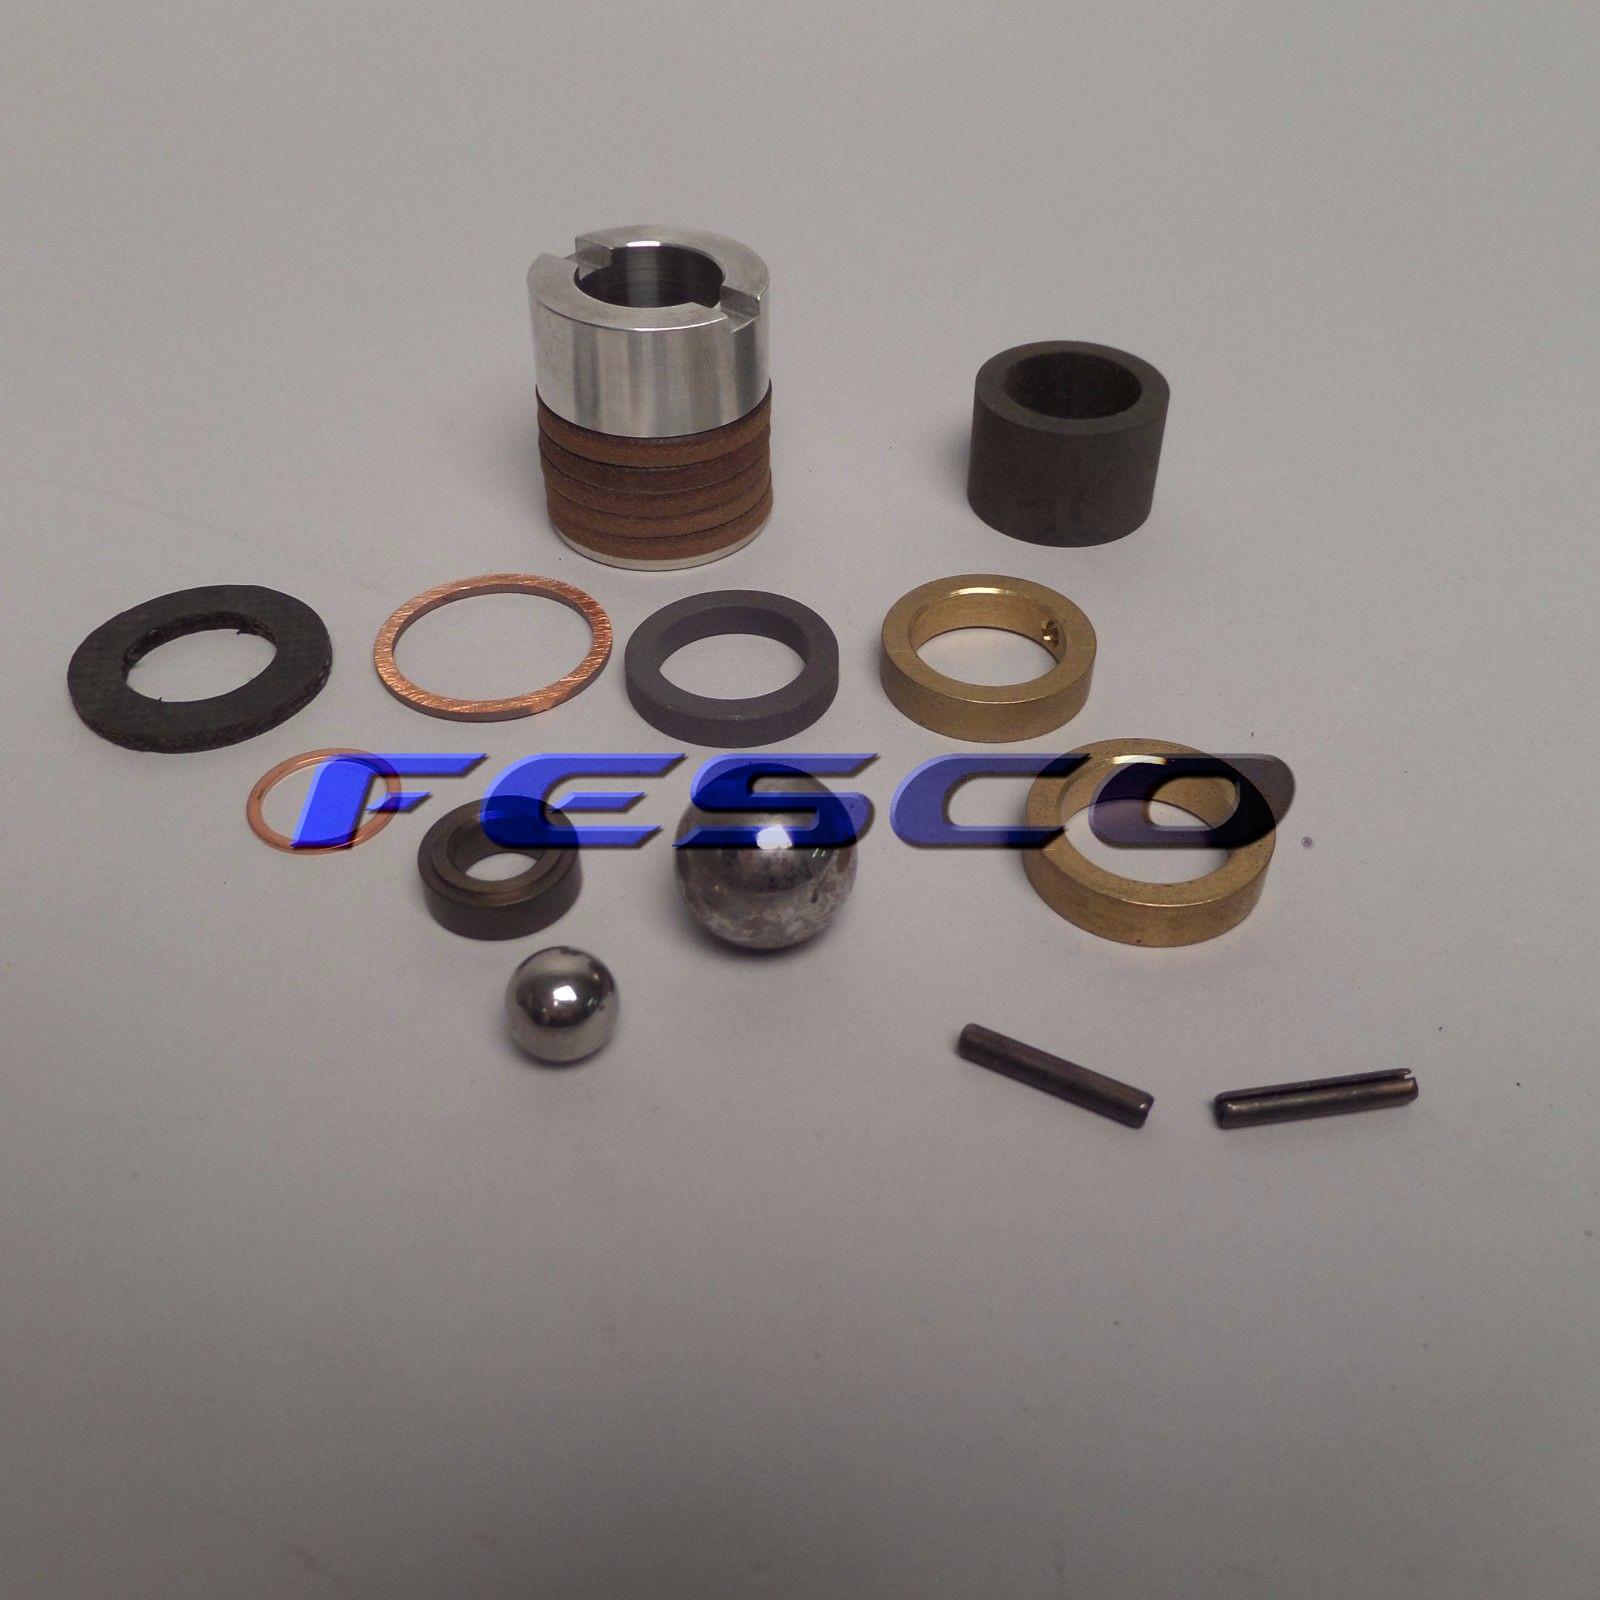 206925 Fluid Section Repair Kit for Graco Fireball 300